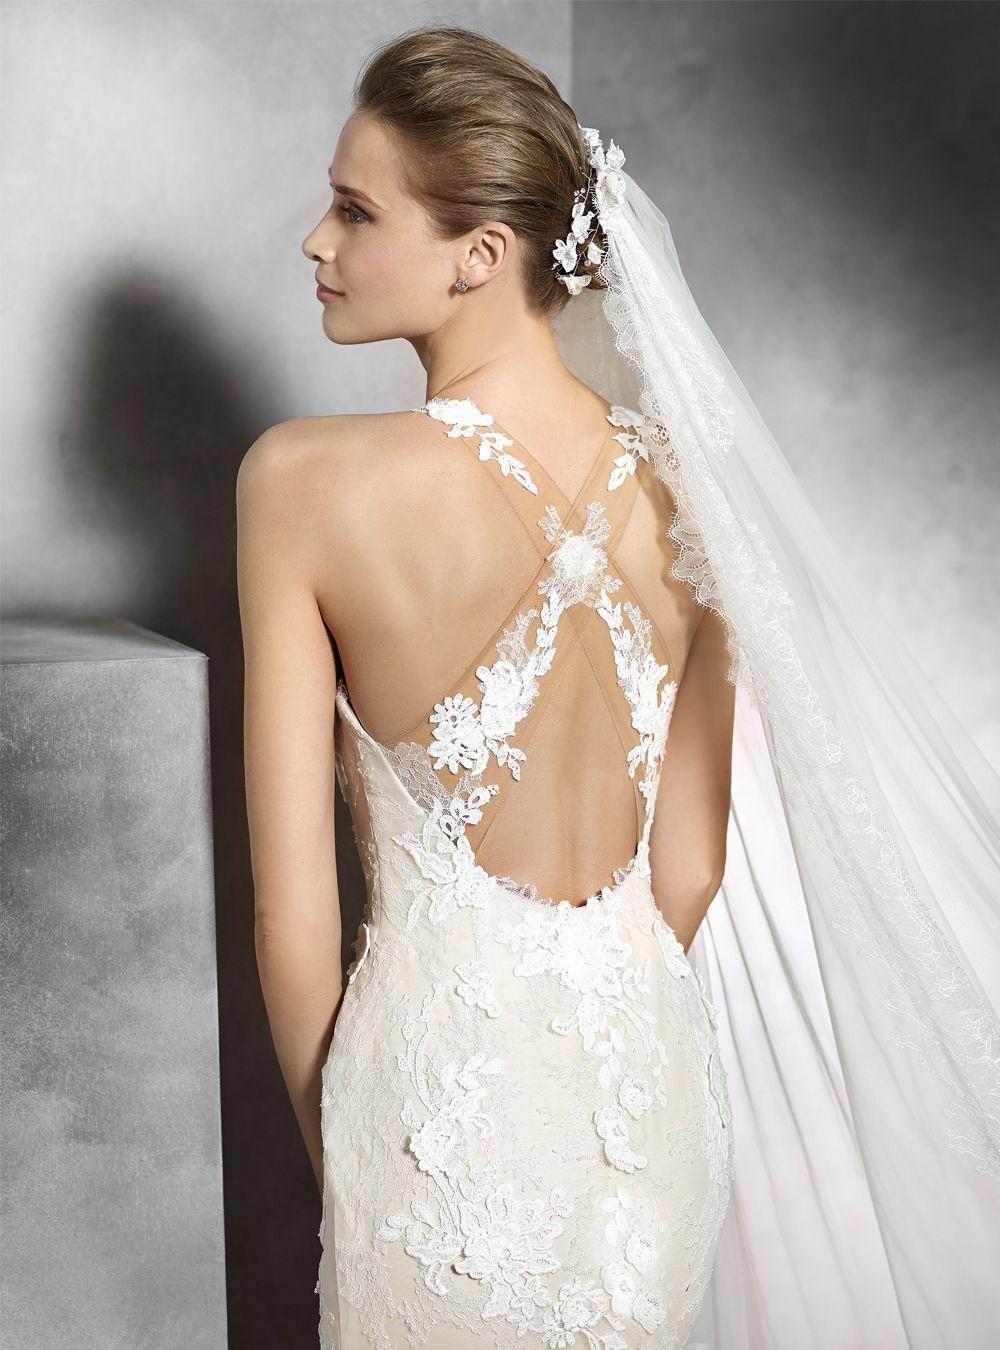 Wedding Dress Maker North Brisbane | Wedding Dress | Pinterest ...